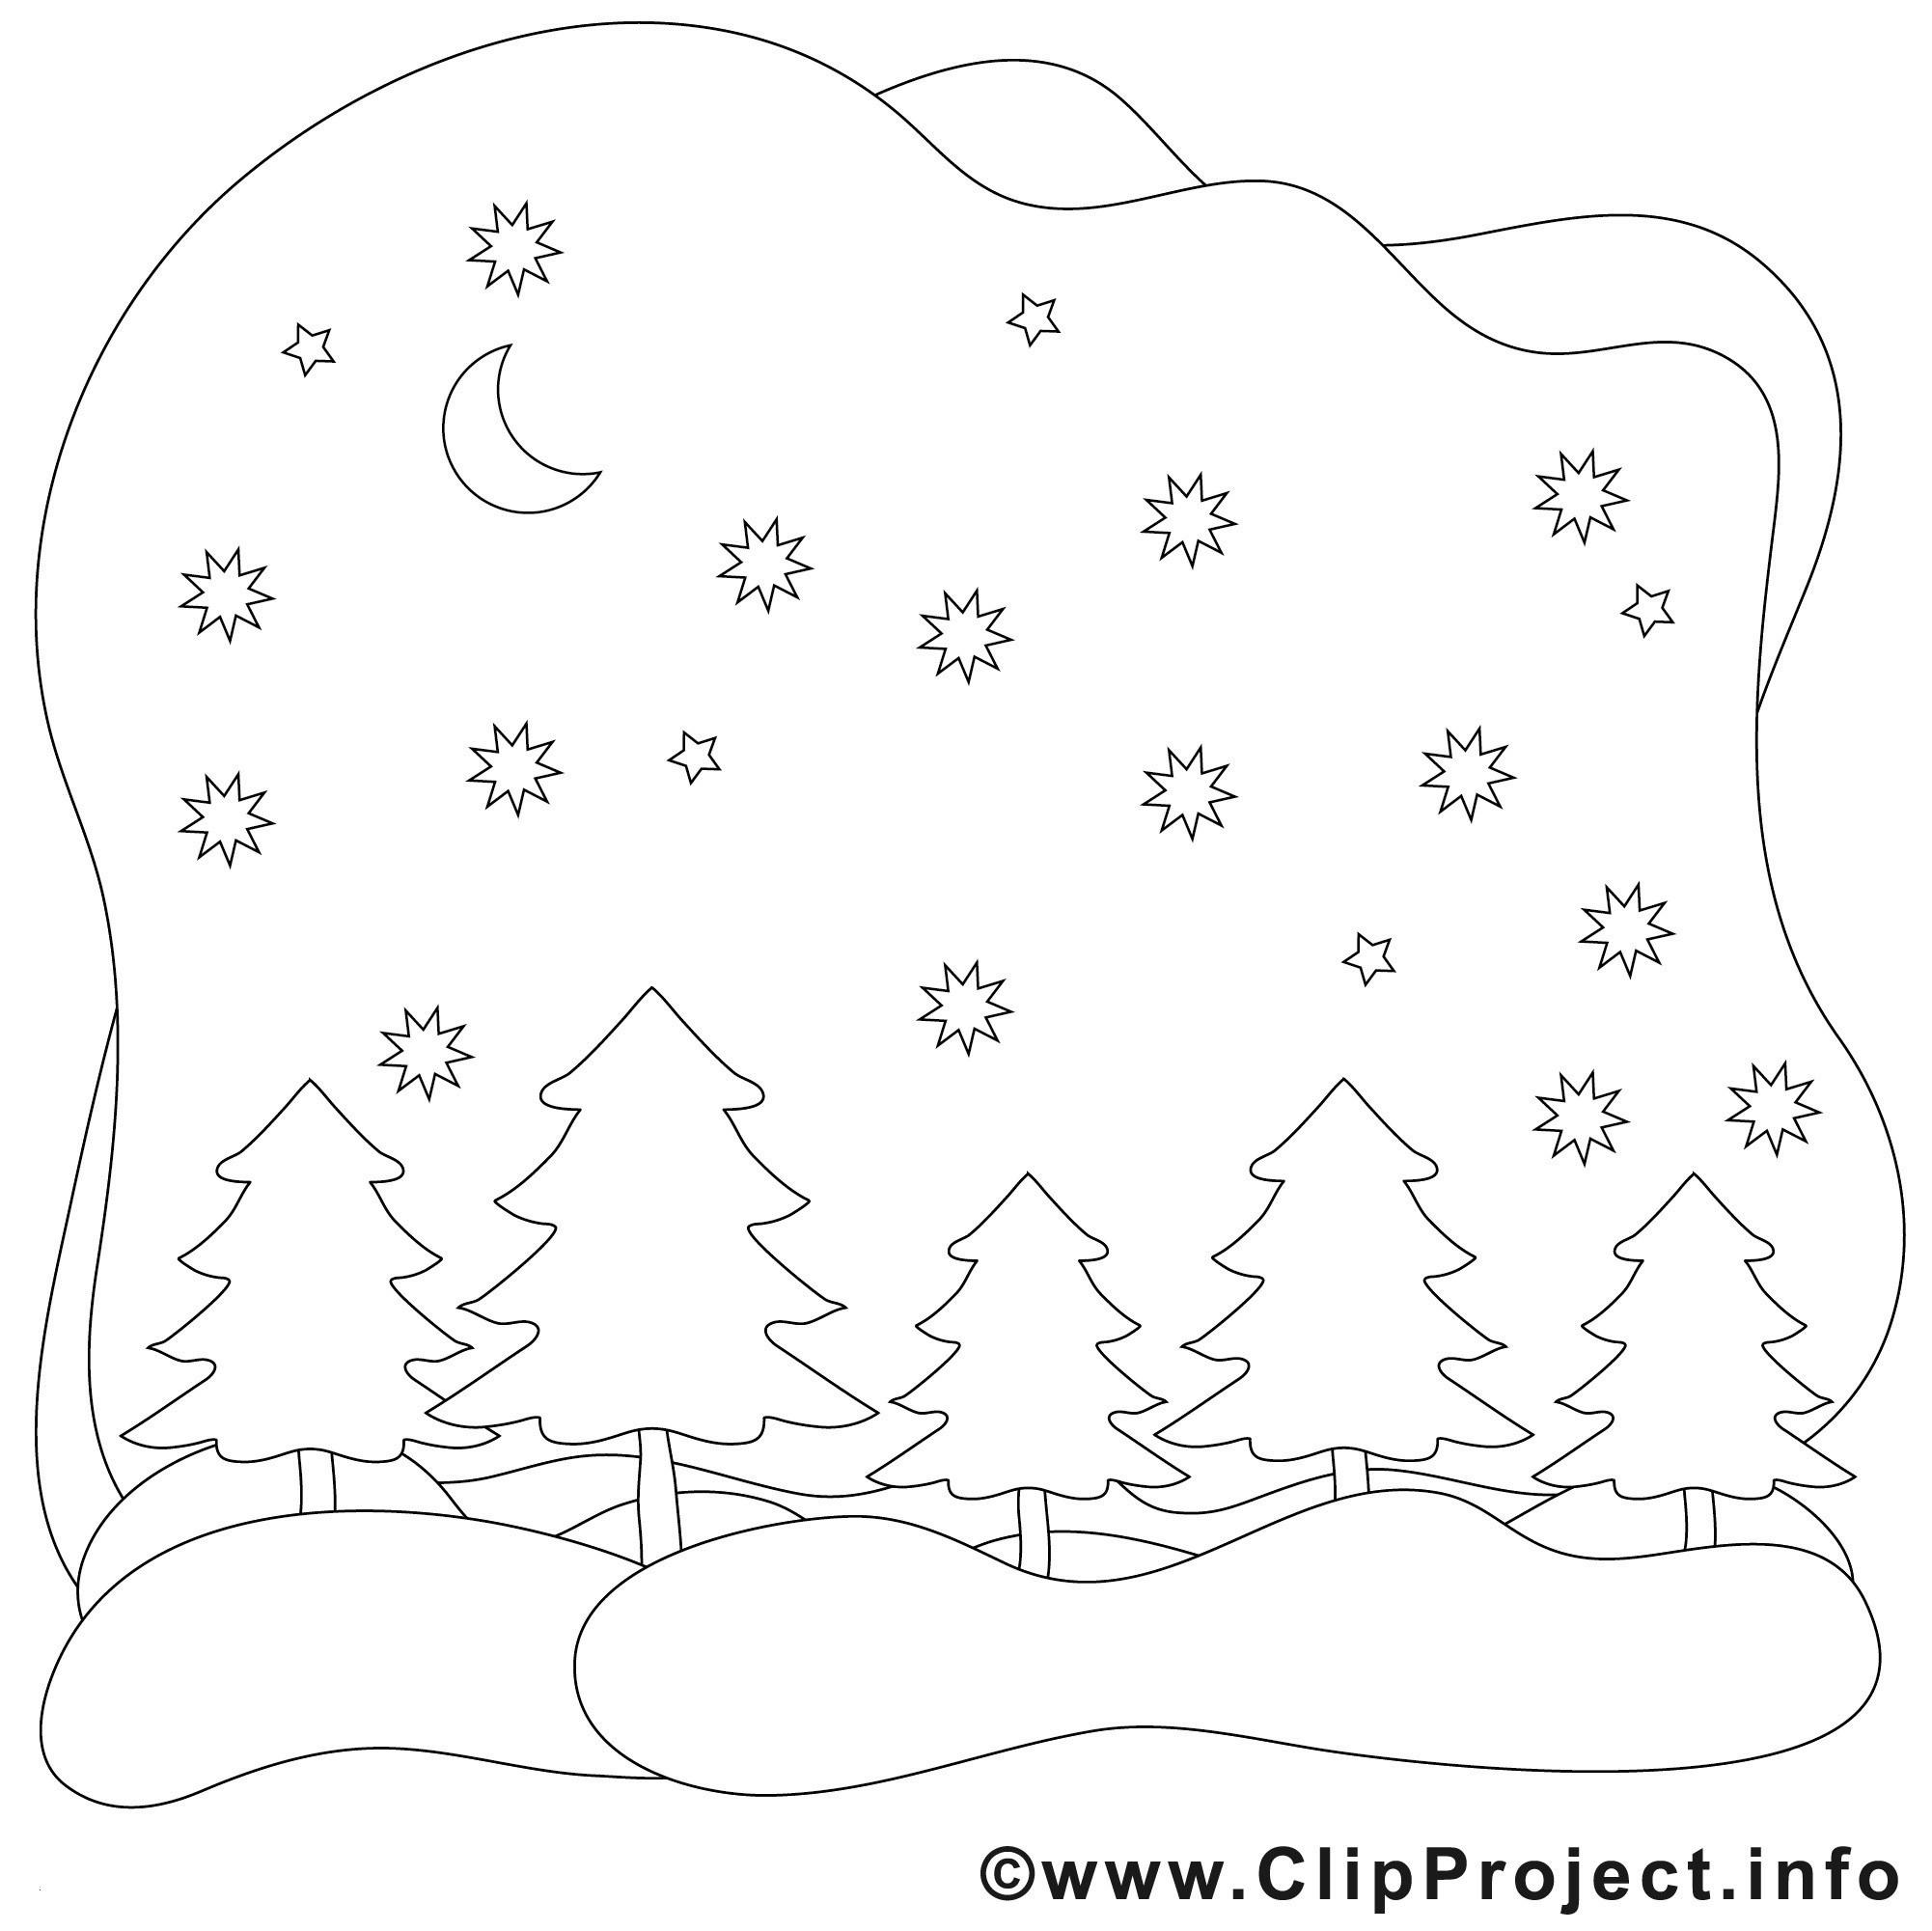 Pippi Langstrumpf Ausmalbilder Neu 38 Ausmalbilder Winter Gratis Scoredatscore Frisch Malvorlagen Fotos